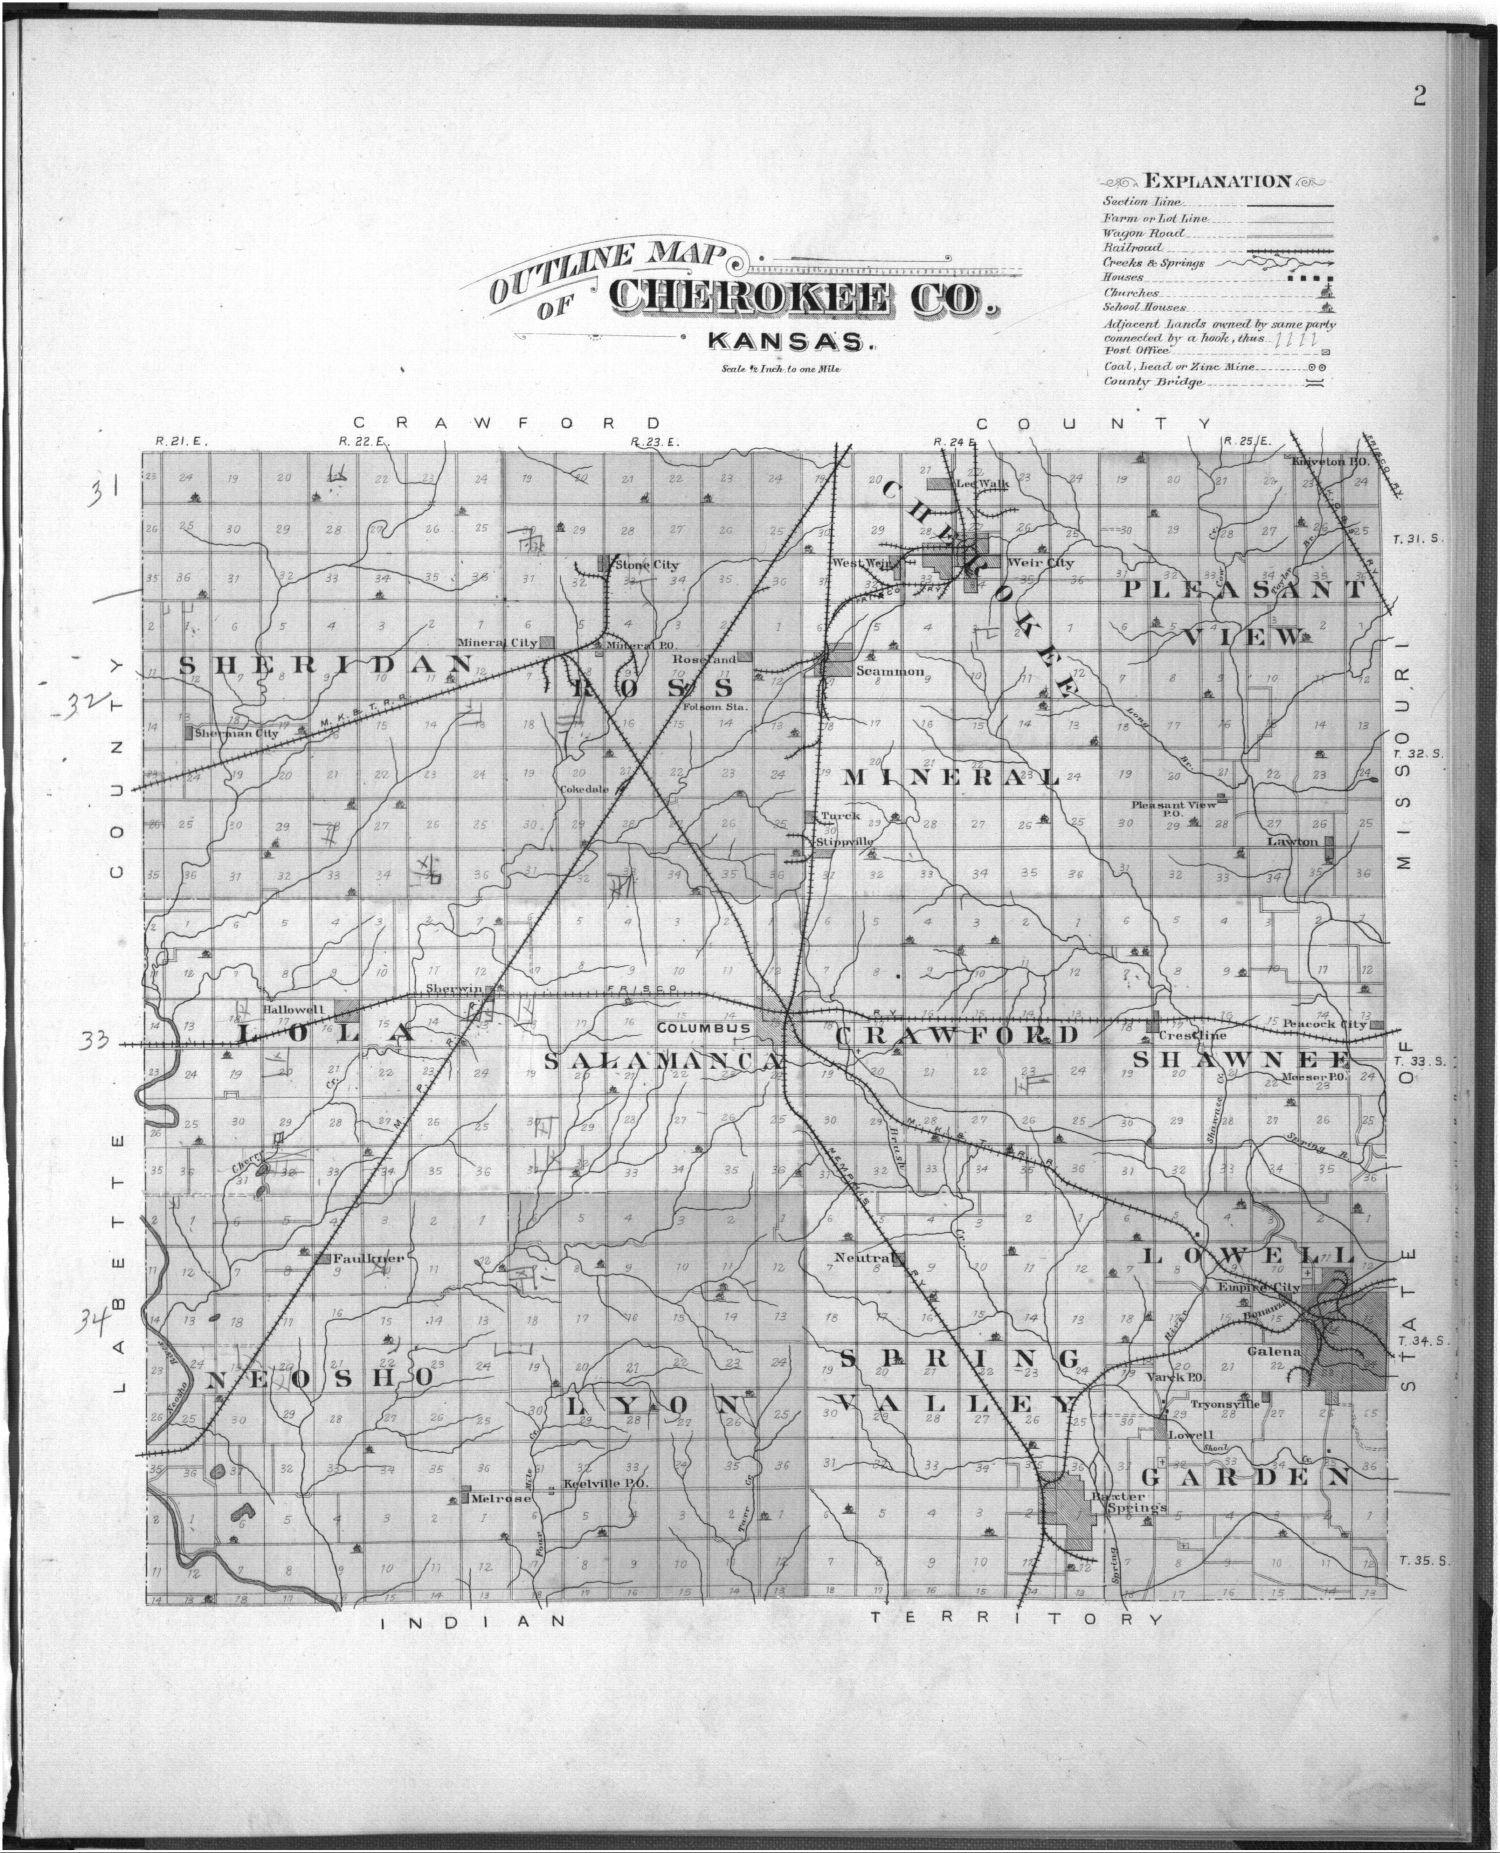 Plat book, Cherokee County, Kansas - 2